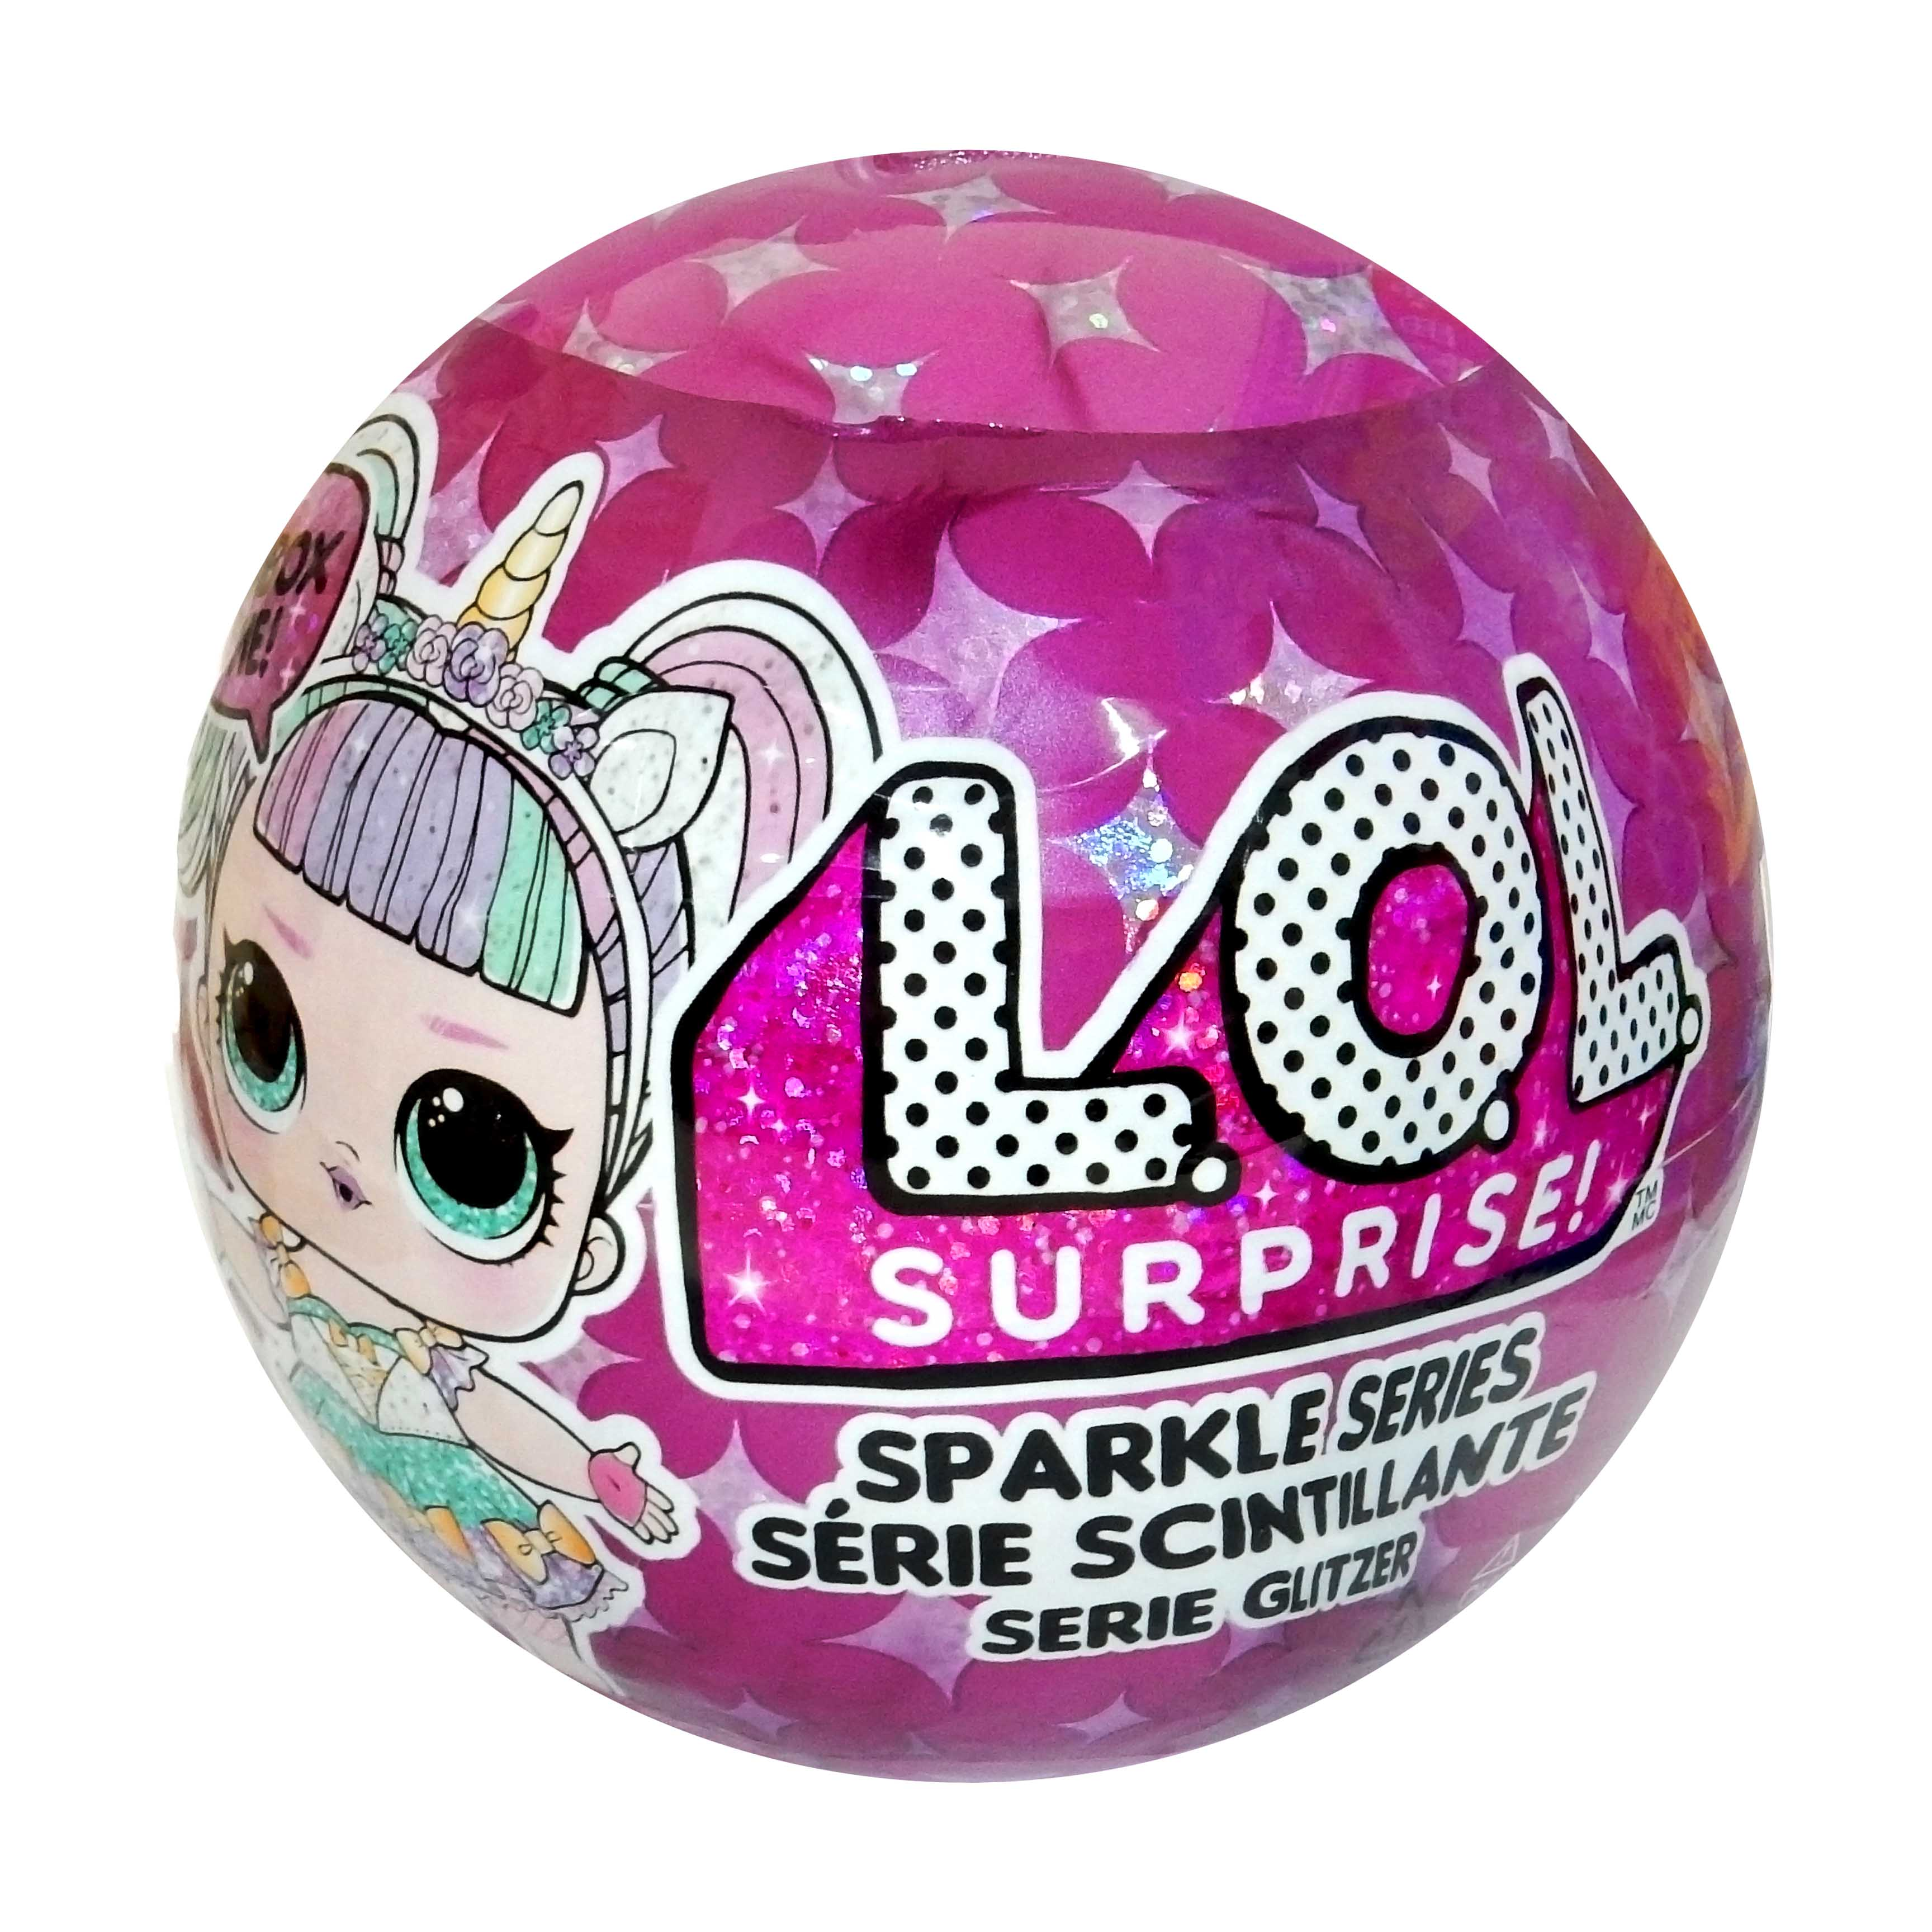 559658 Papusa L.O.L. Surprise! SPARKLE Series (in asortiment)